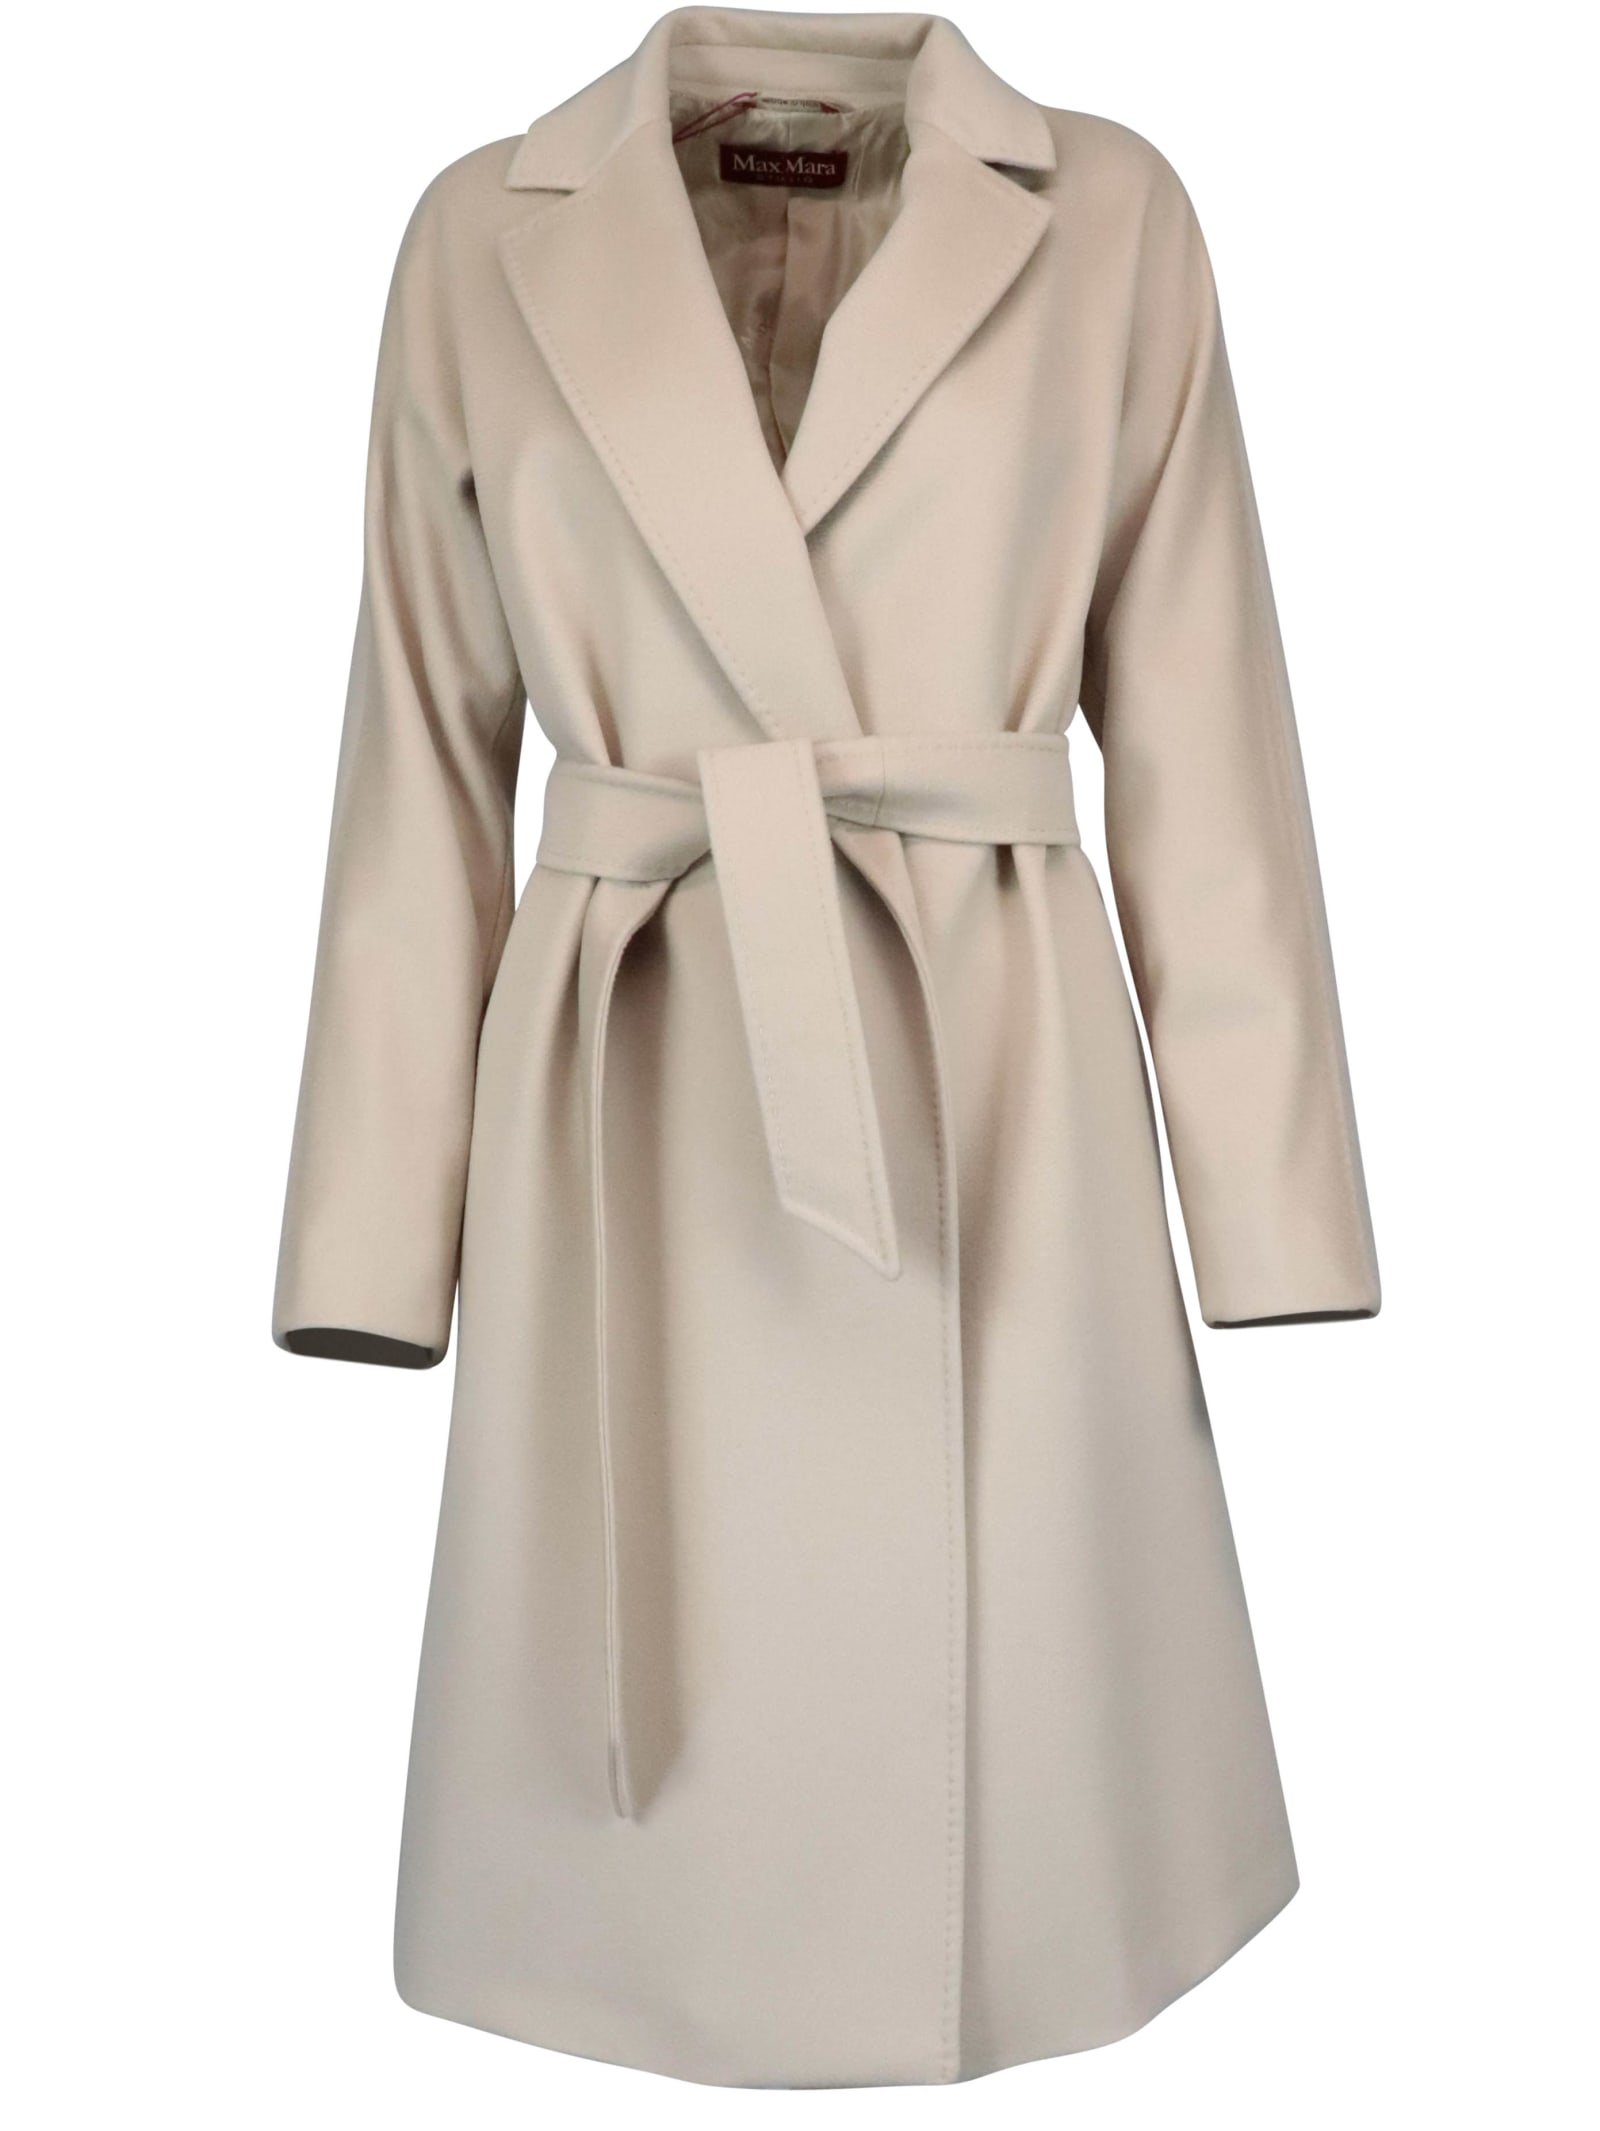 Max Mara Studio Luana Coat